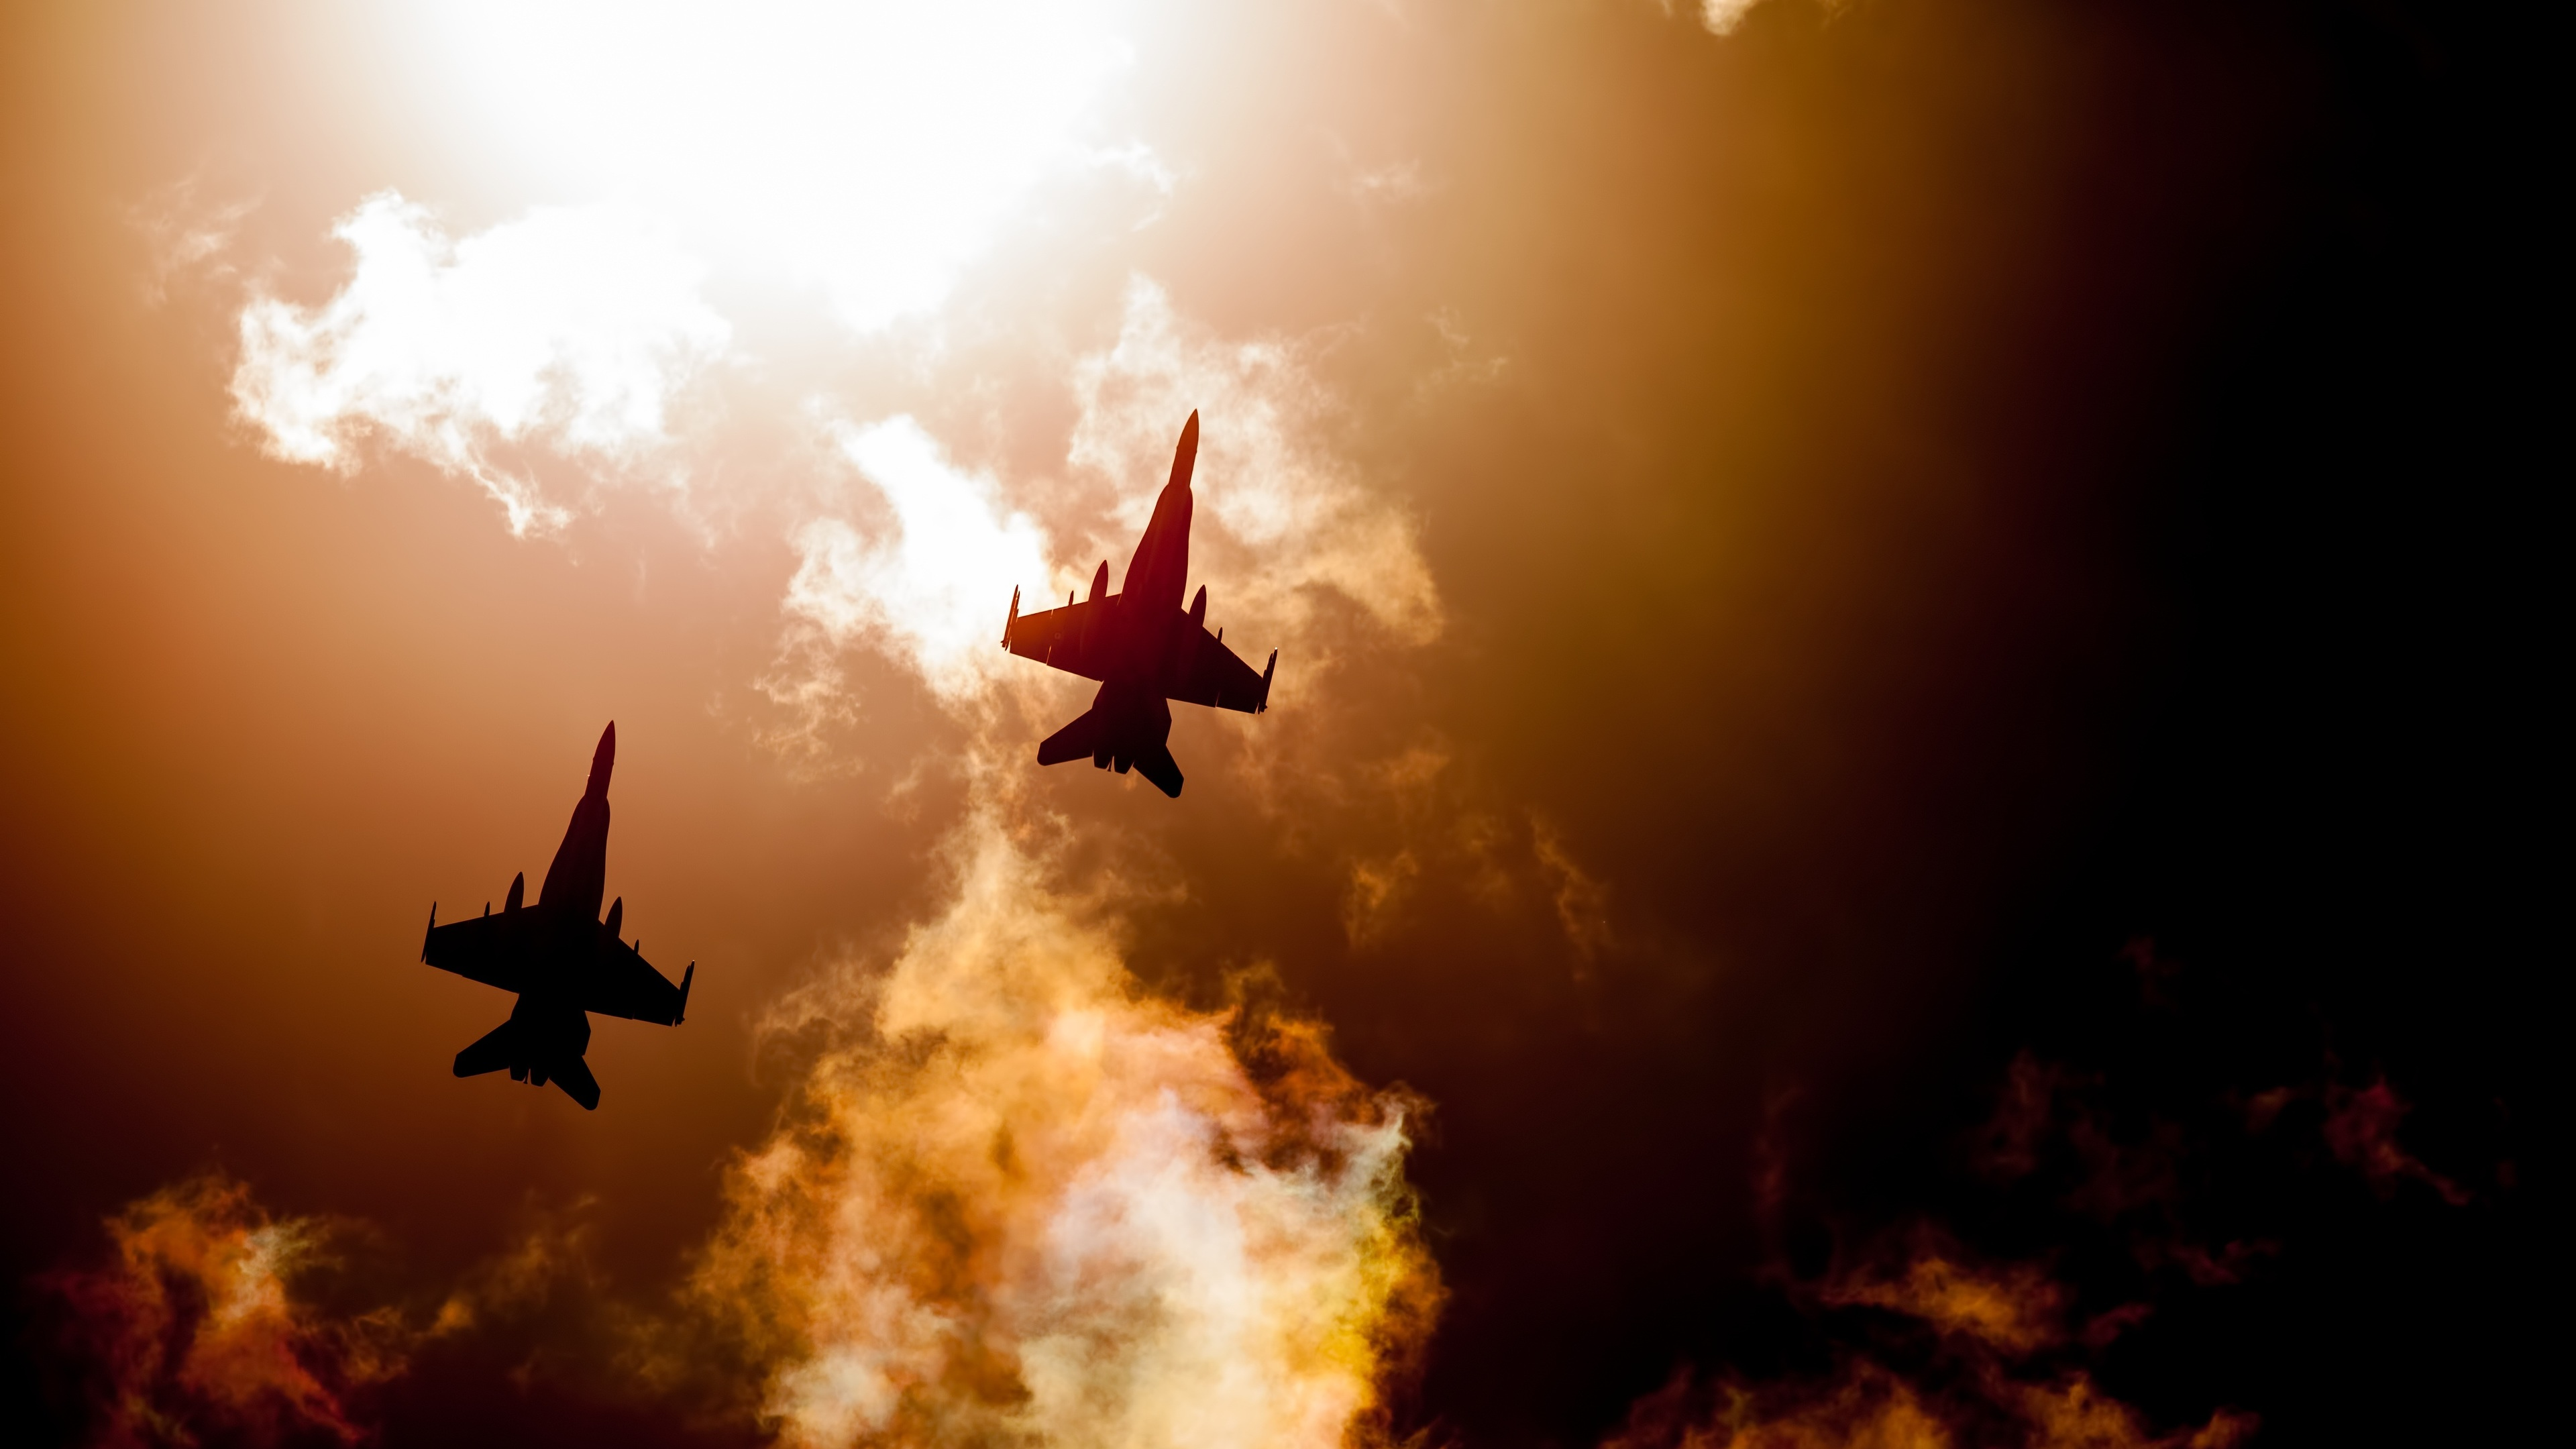 jet fighters 4k 1547938008 - Jet Fighters 4k - sky wallpapers, planes wallpapers, jet wallpapers, hd-wallpapers, 5k wallpapers, 4k-wallpapers